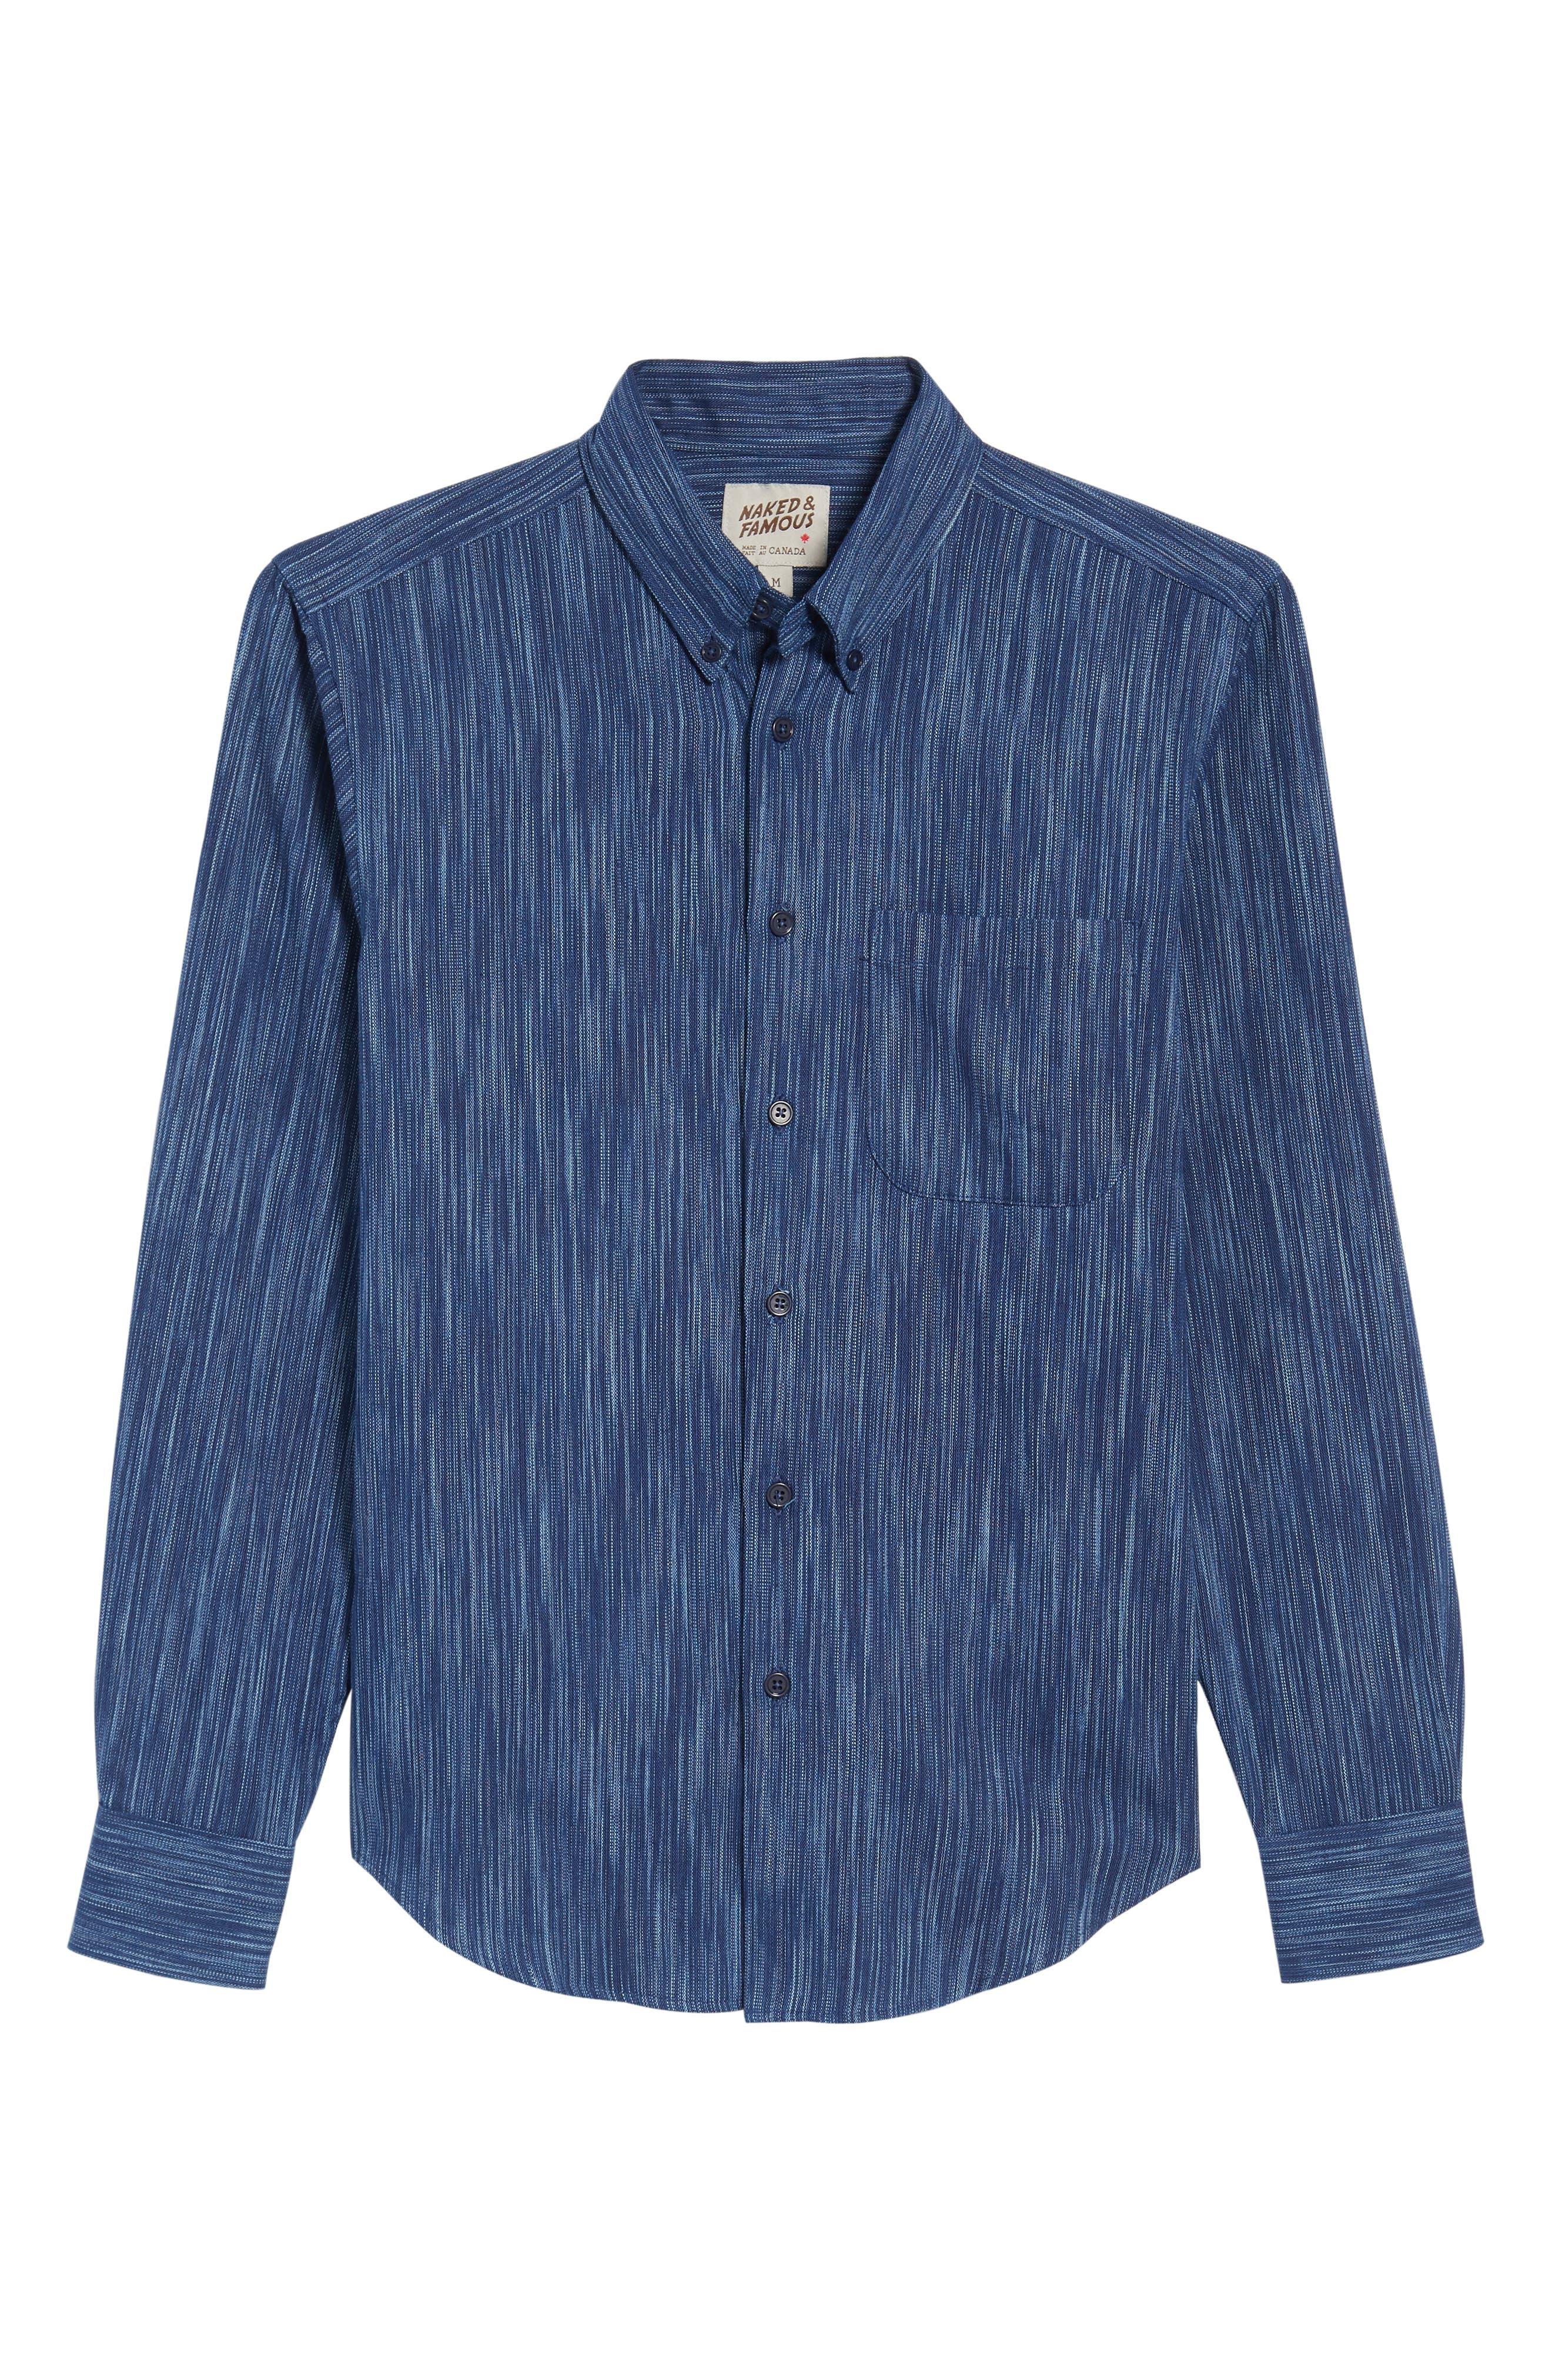 Indigo Tie Dye Rain Weave Shirt,                             Alternate thumbnail 6, color,                             Blue